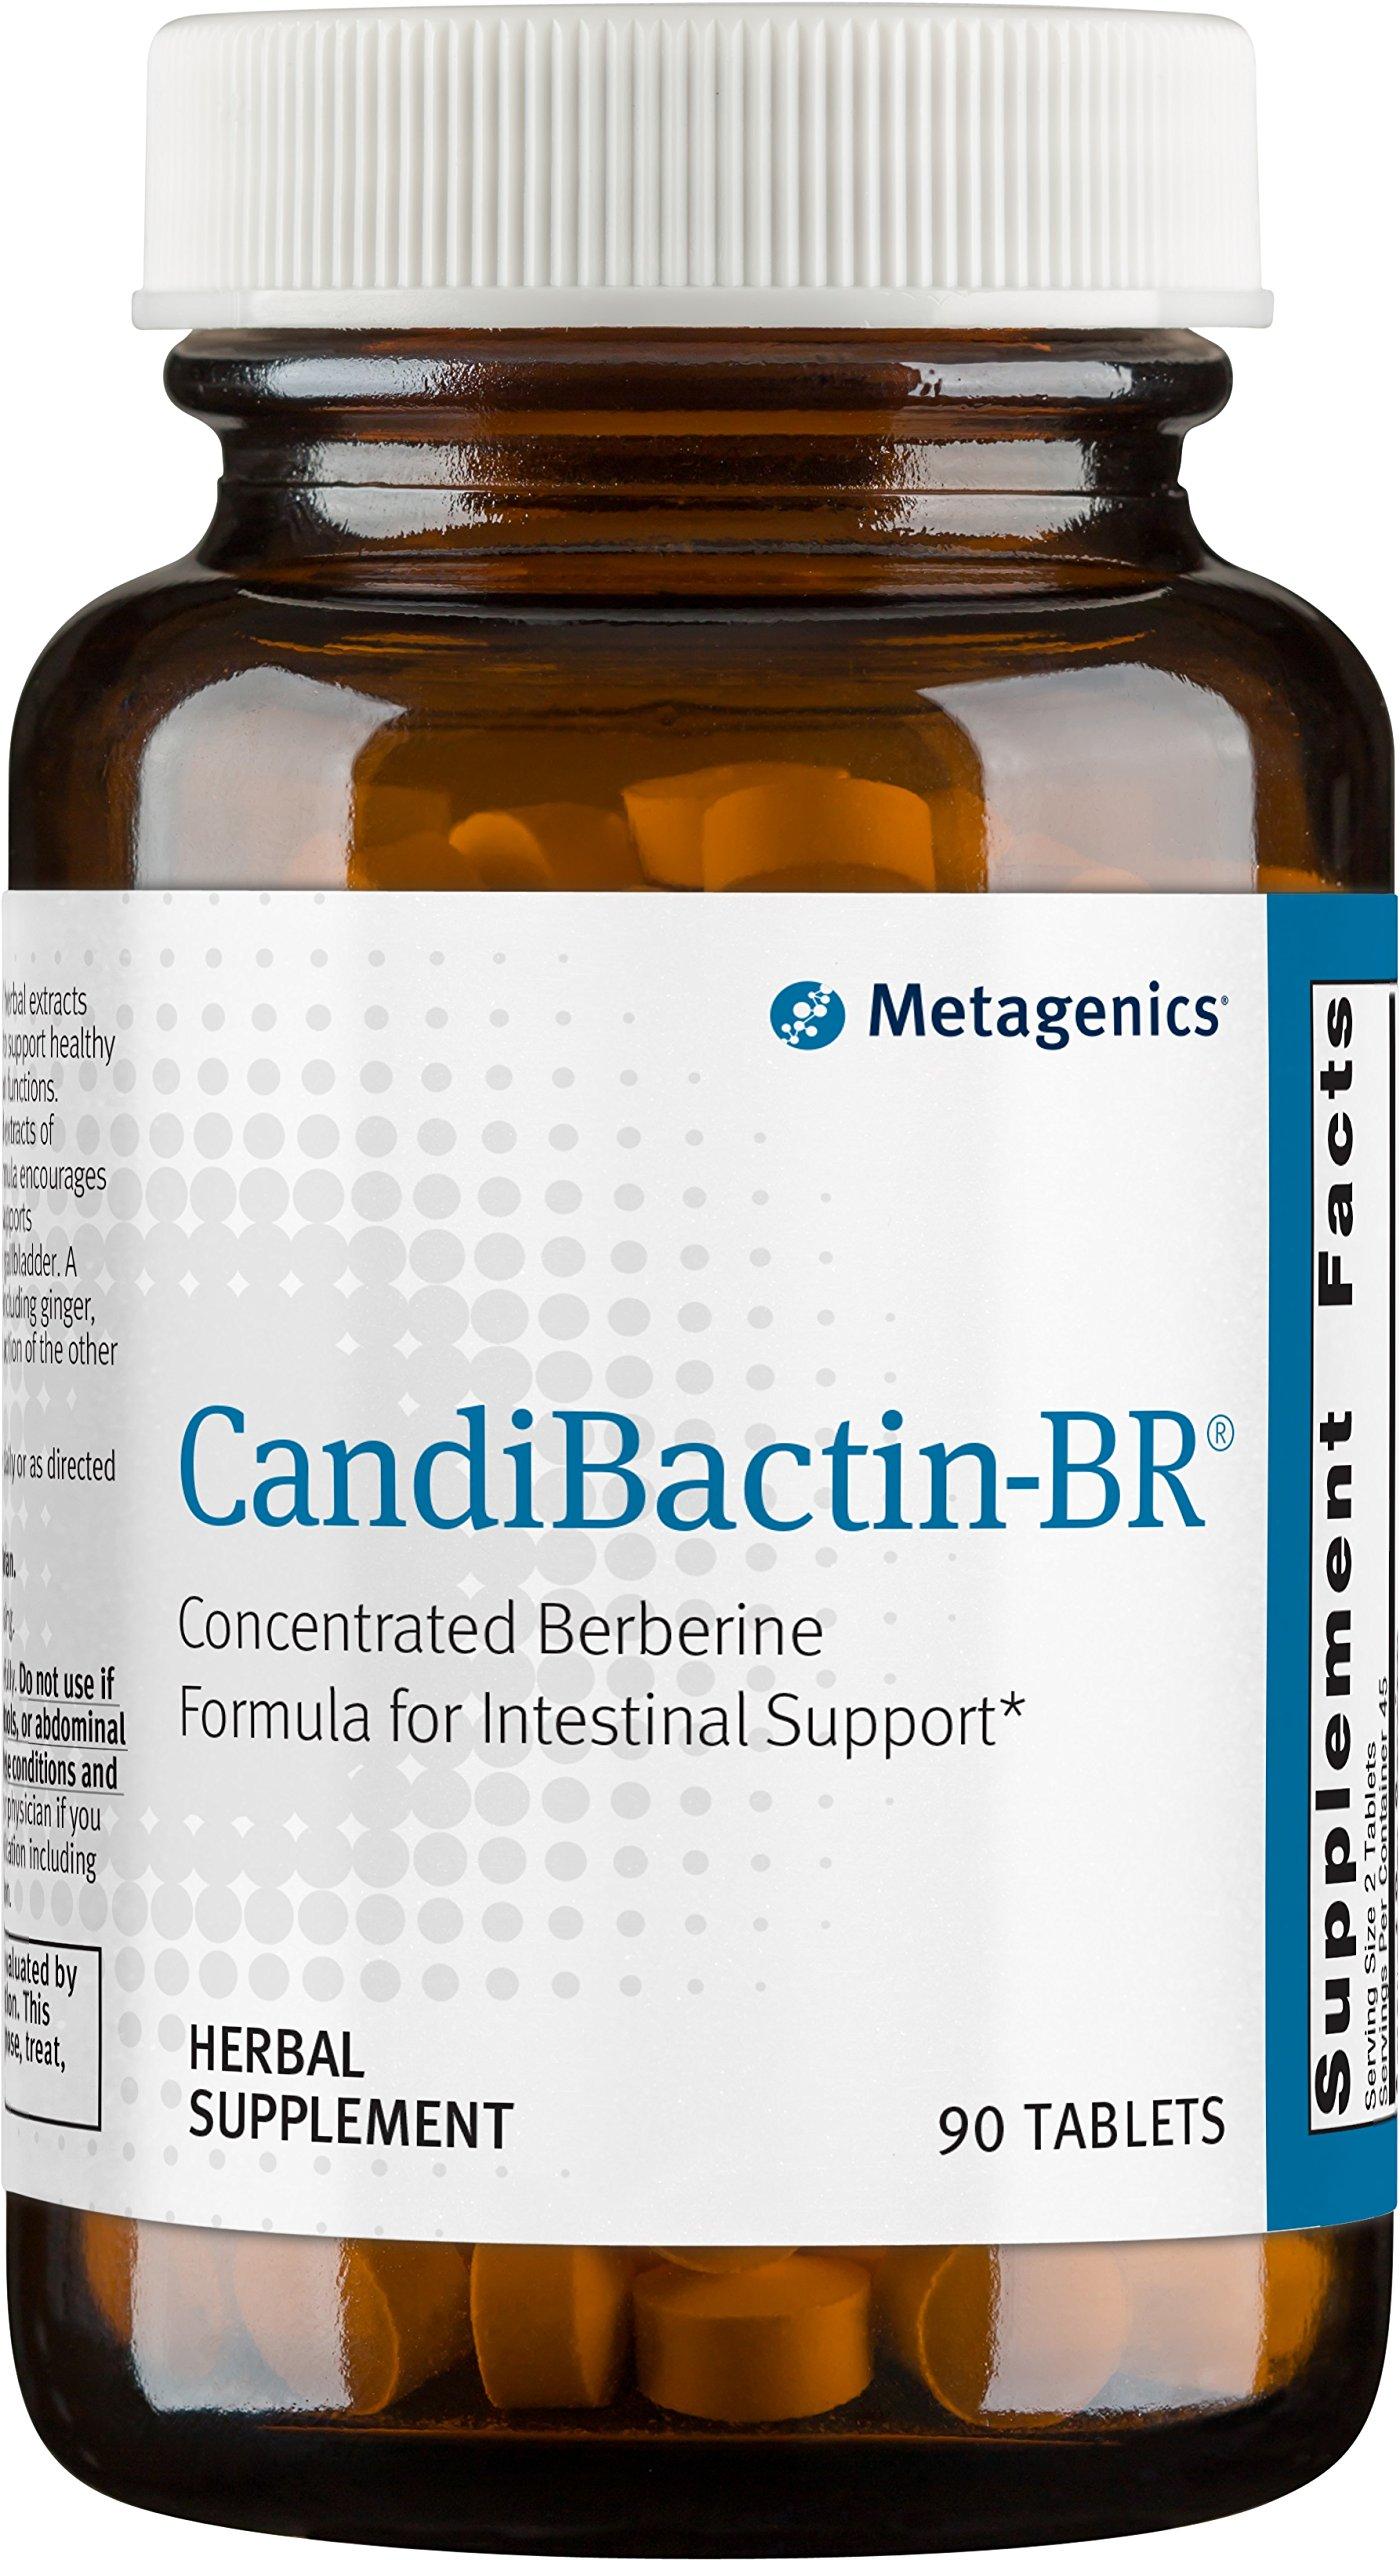 Metagenics - CandiBactin-BR, 90 Count by Metagenics (Image #1)